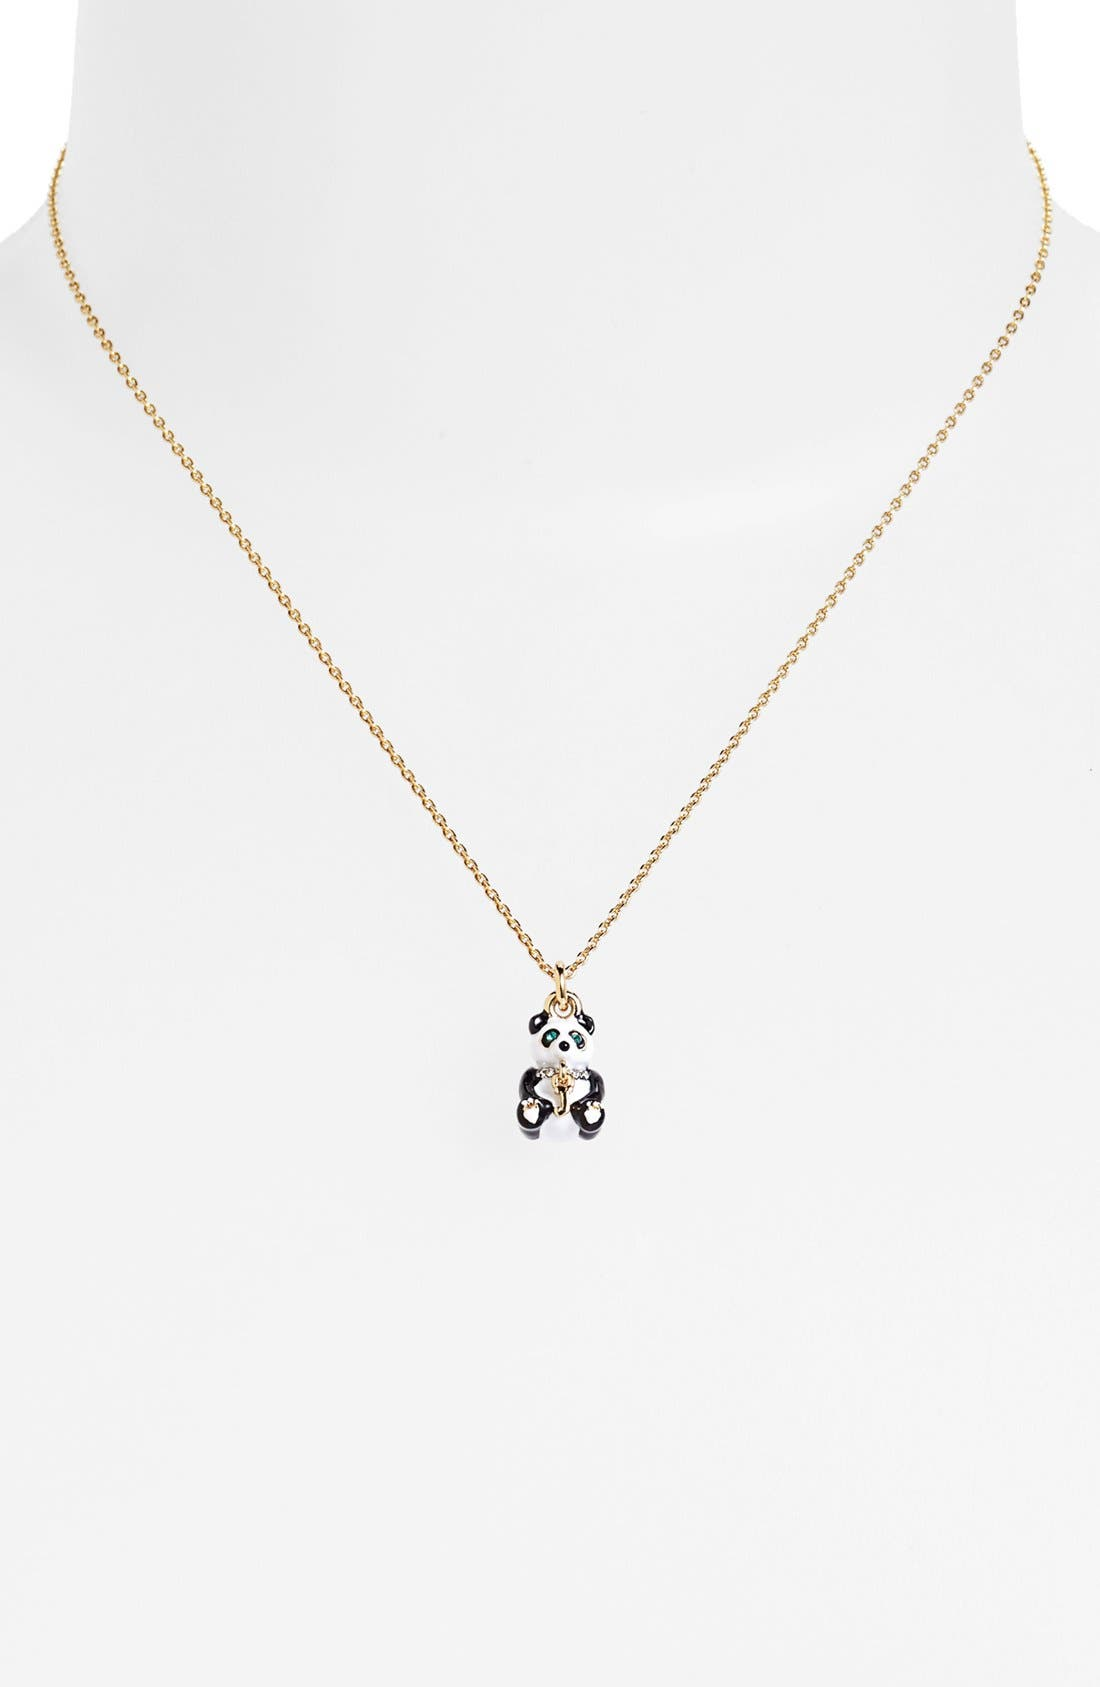 Main Image - Juicy Couture Boxed Panda Charm Pendant Necklace